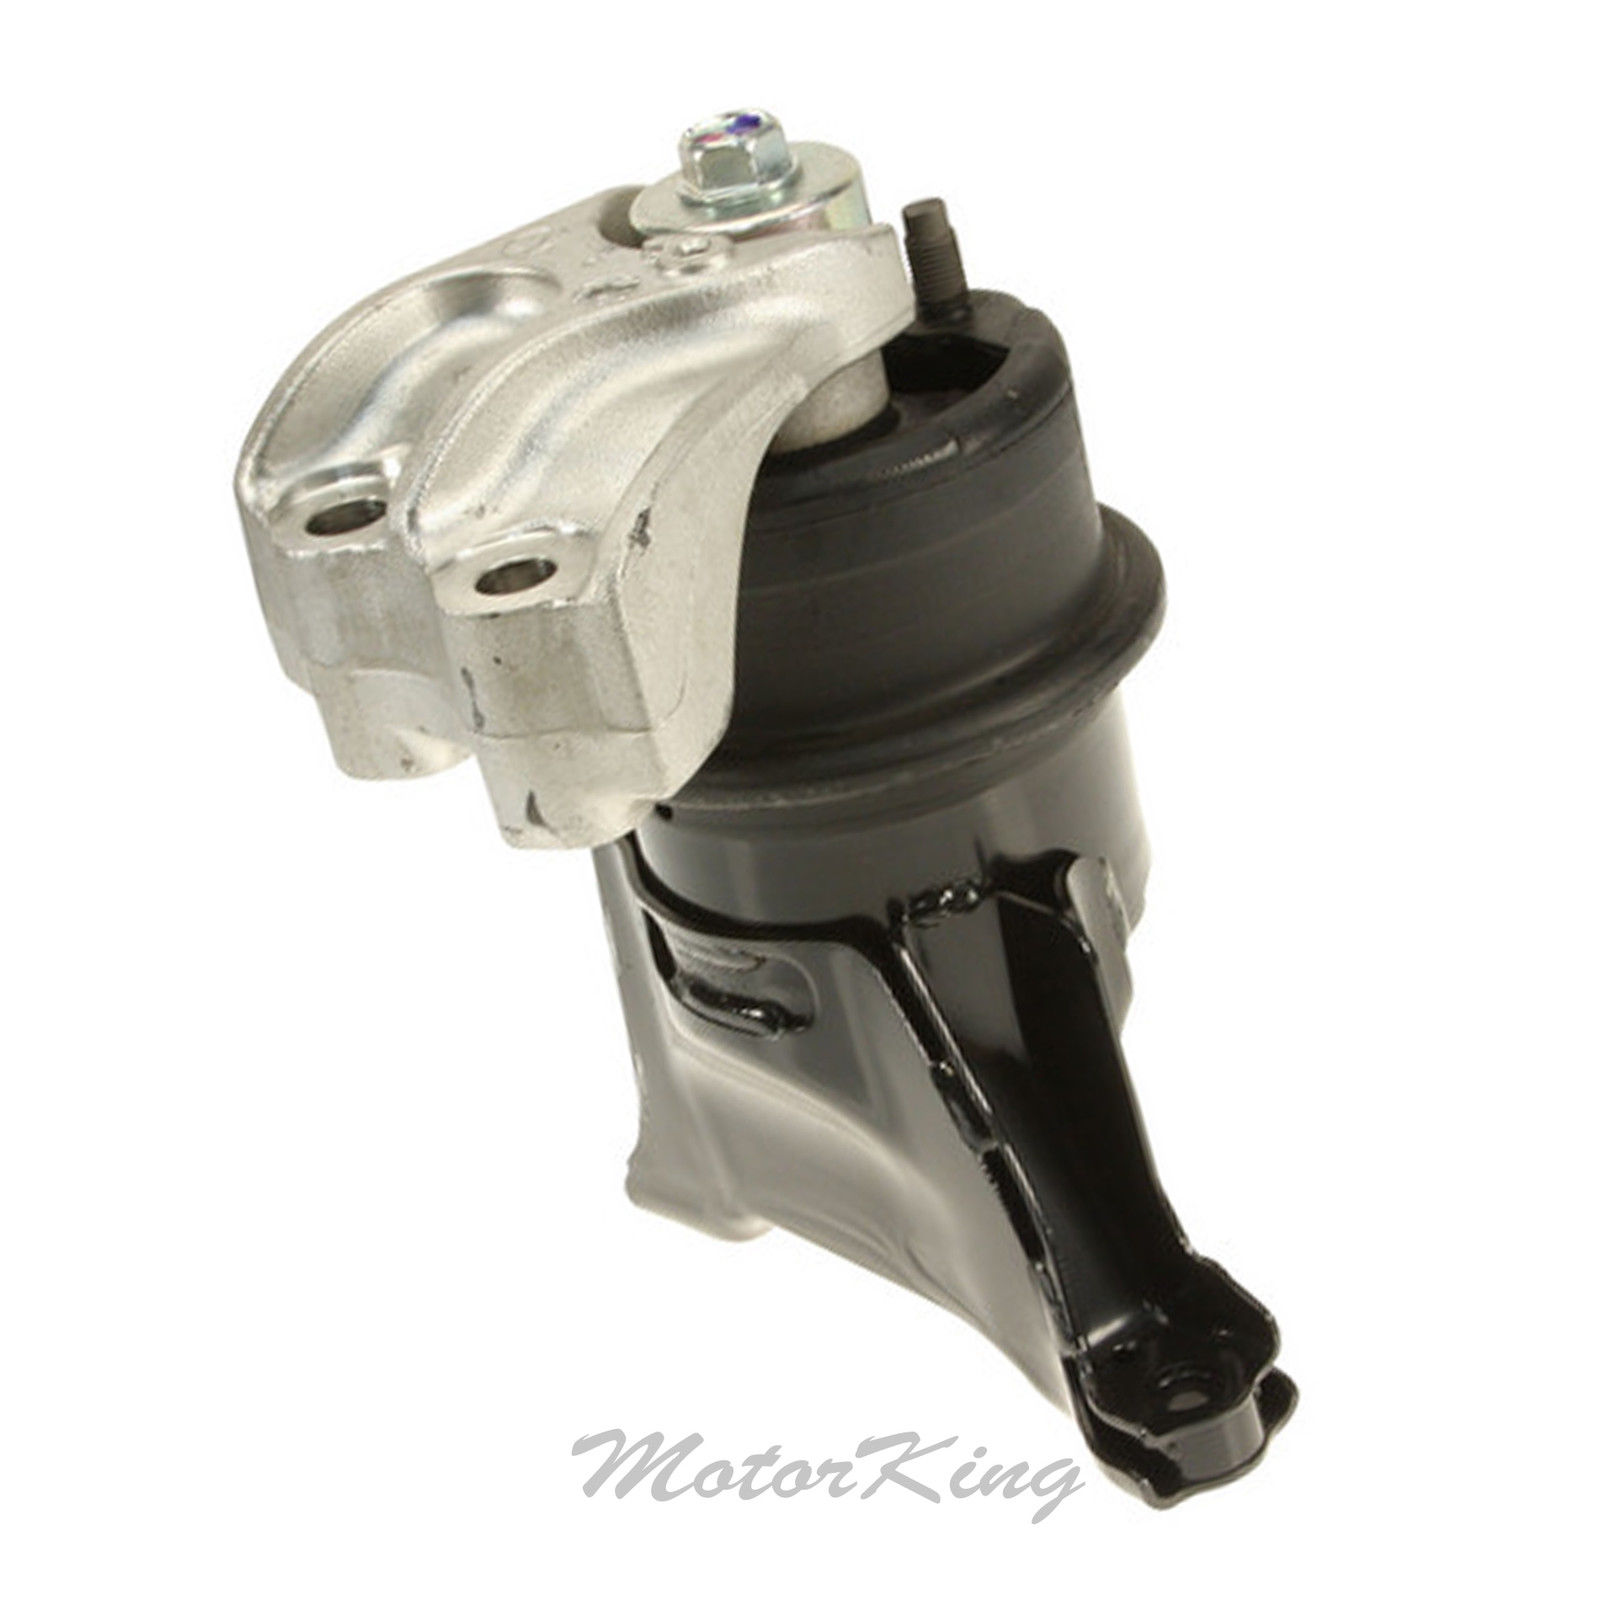 Seab Ab on Honda Civic Windshield Washer Pump